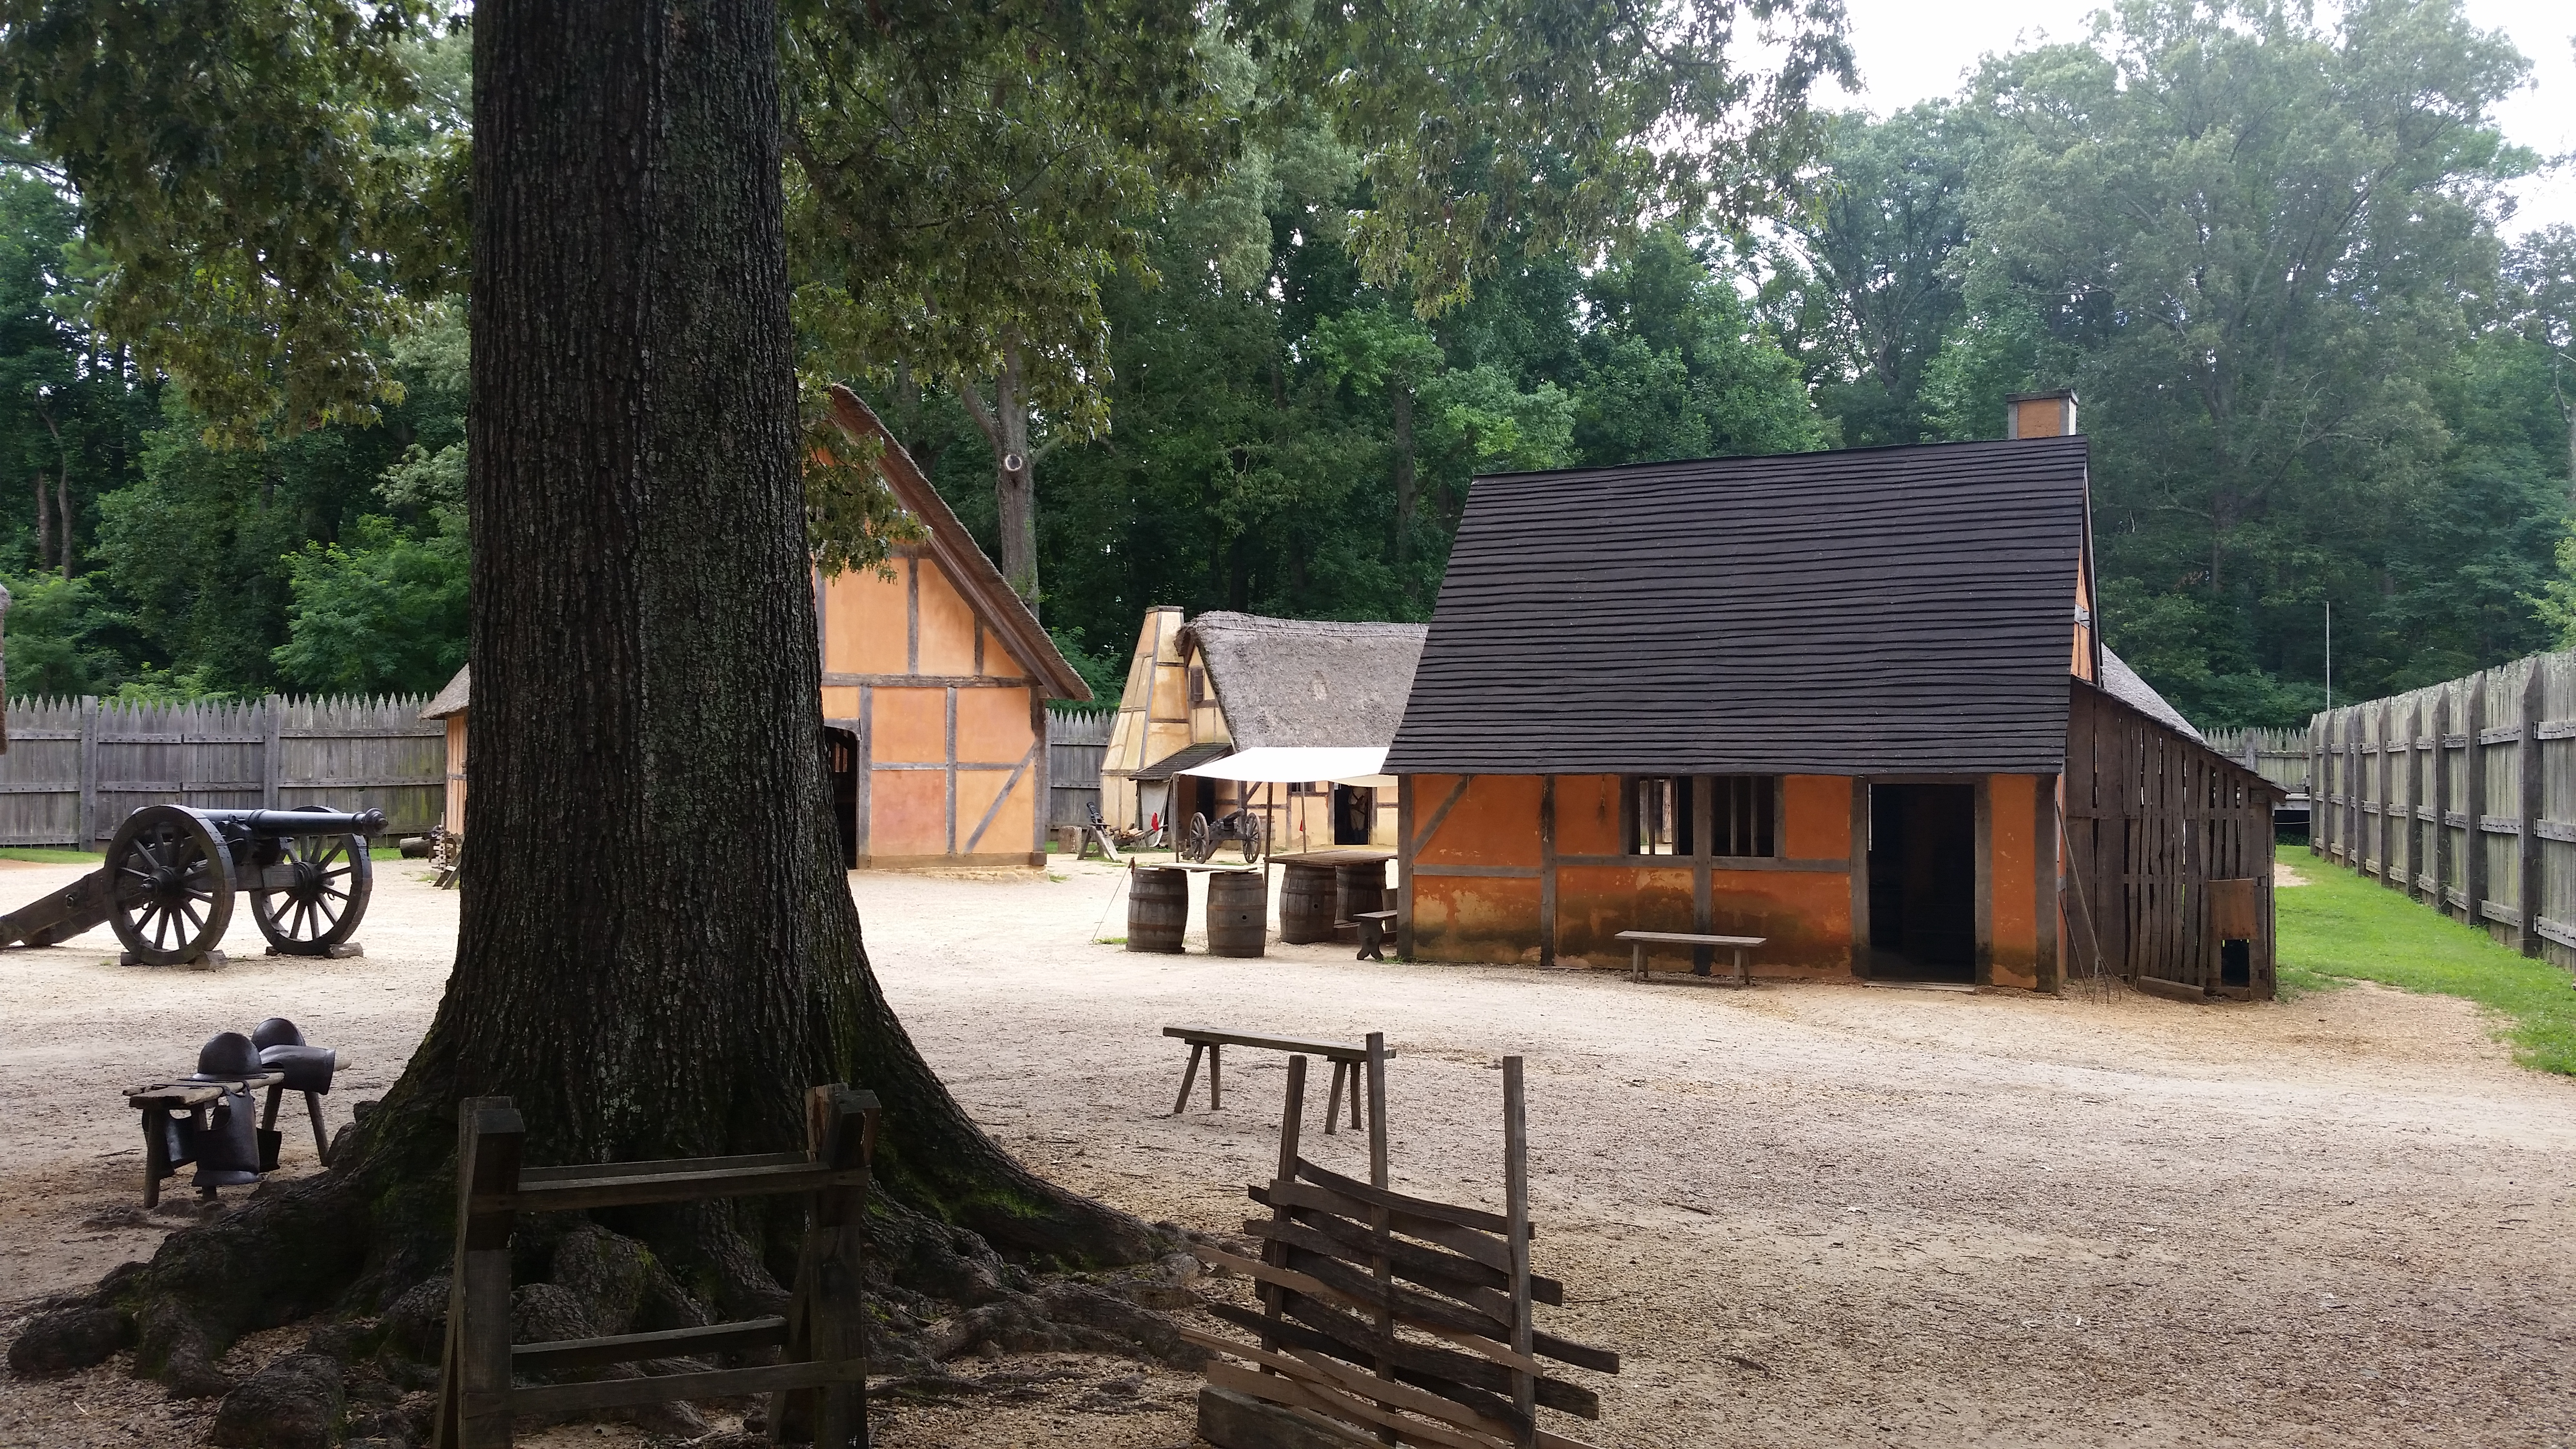 What Is Jamestown >> Jamestown Settlement Wikipedia